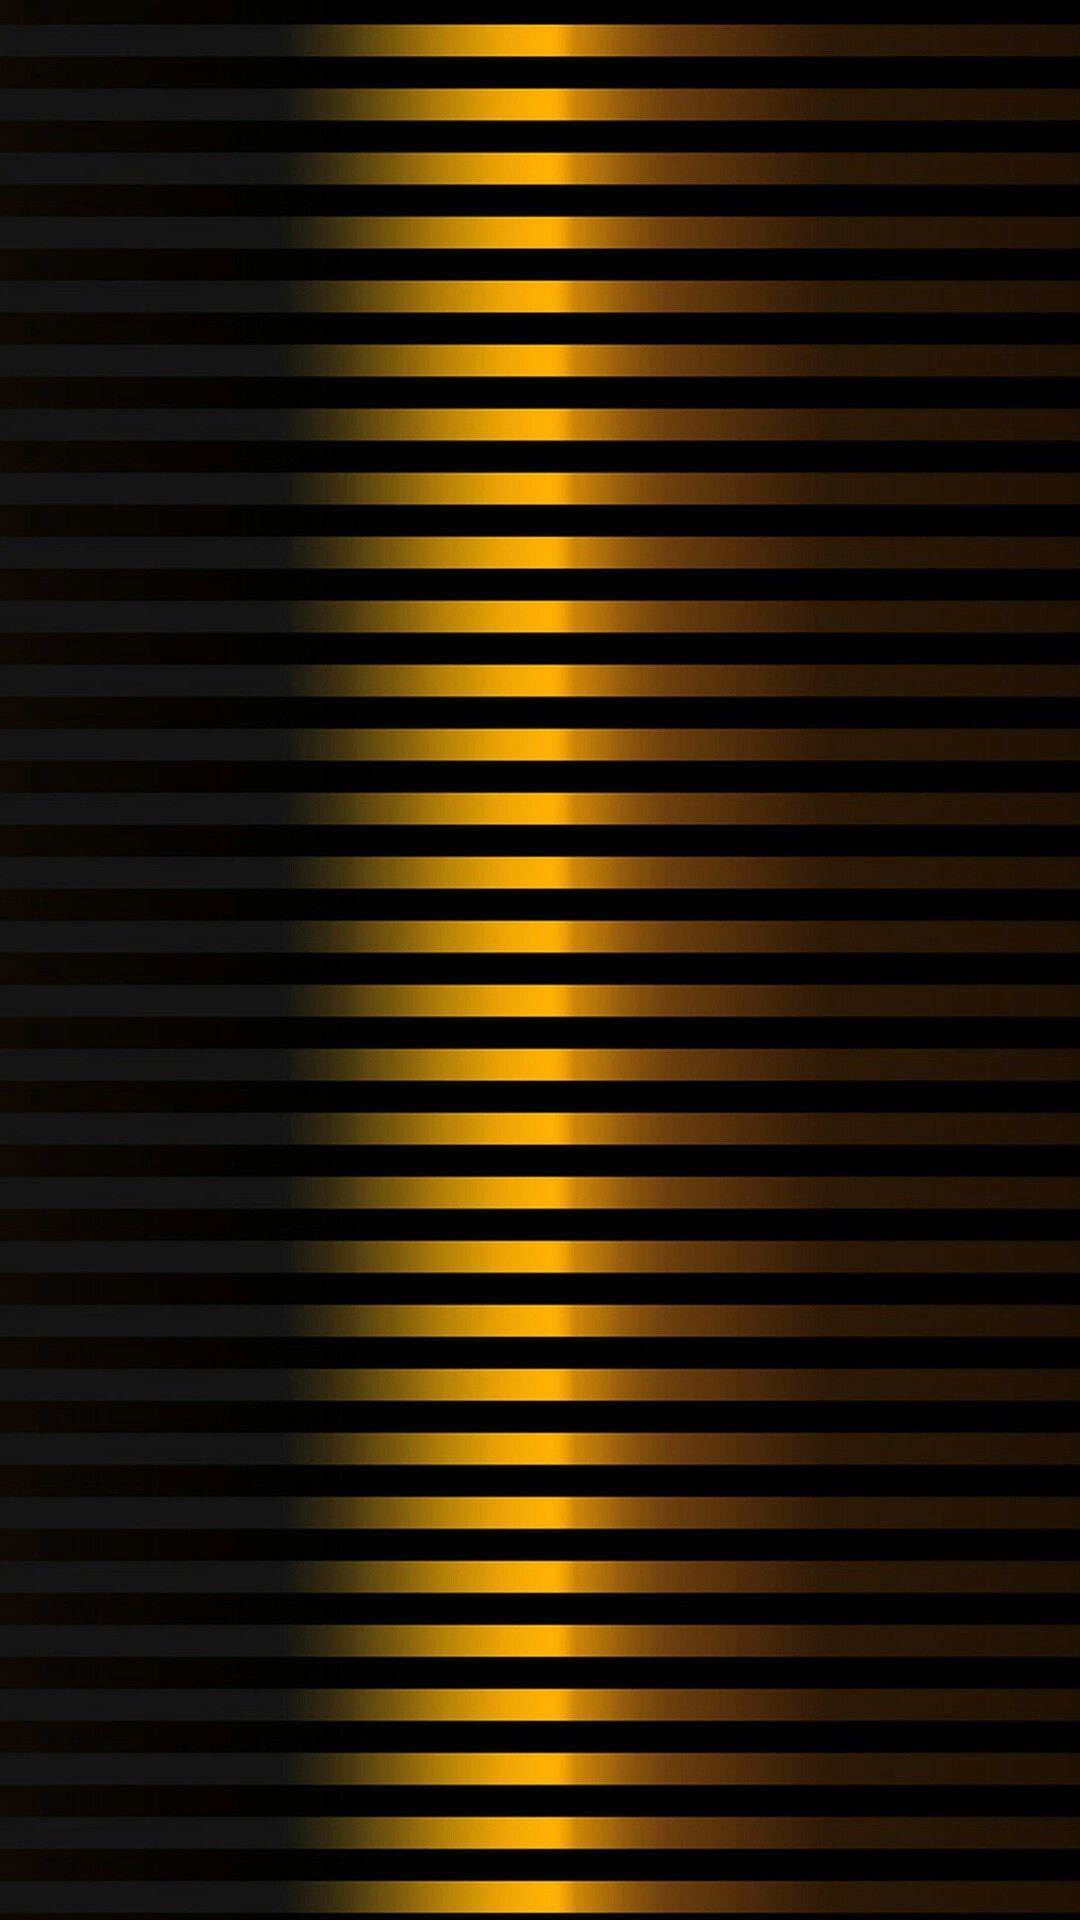 Gold And Black Wallpaper Samsung S Wallpaper Wallpaper Edge Wallpaper Shelves Cellphone Wallpaper